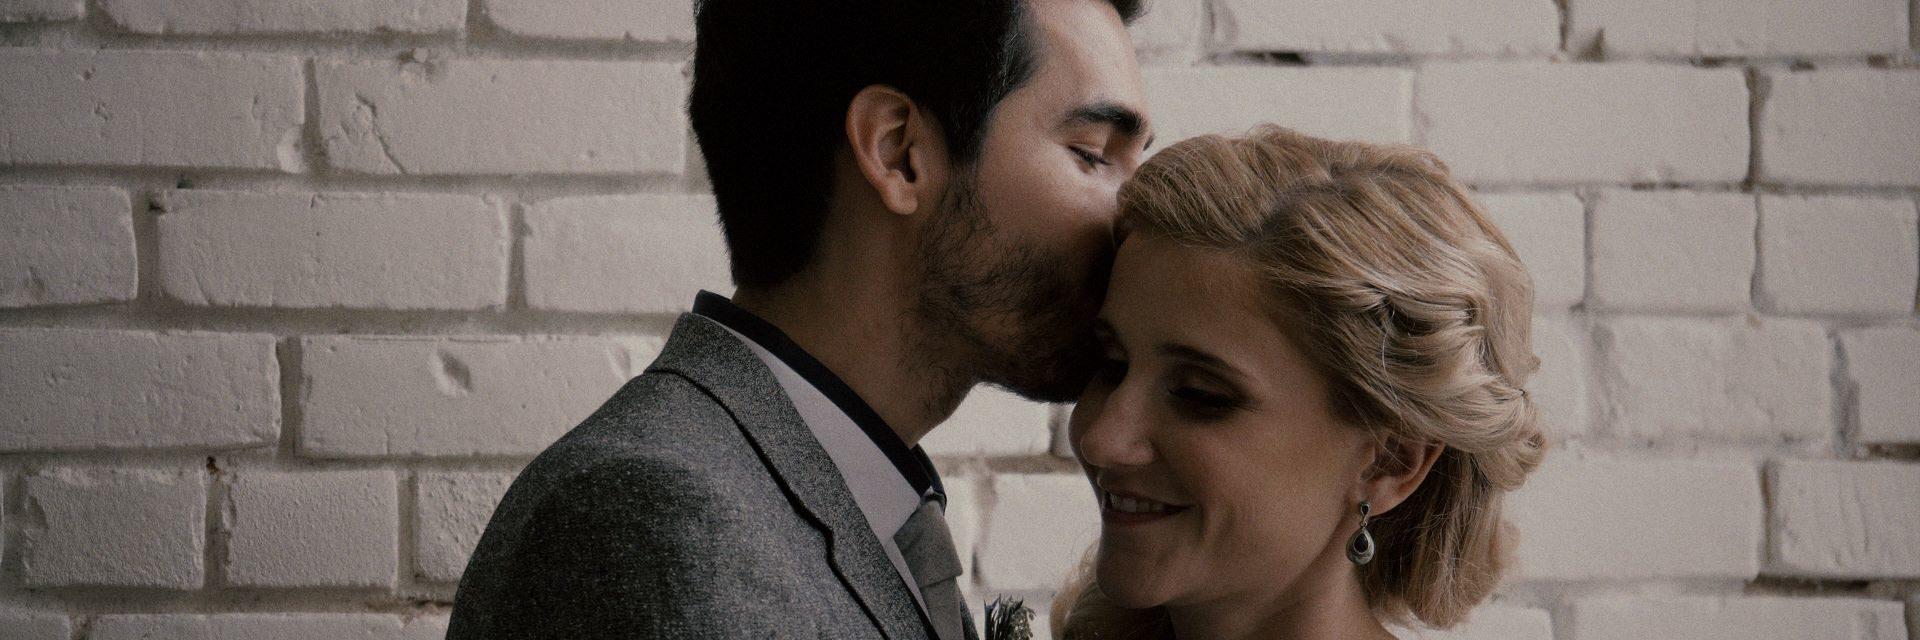 Firenze-wedding-videographer-cinemate-films-03